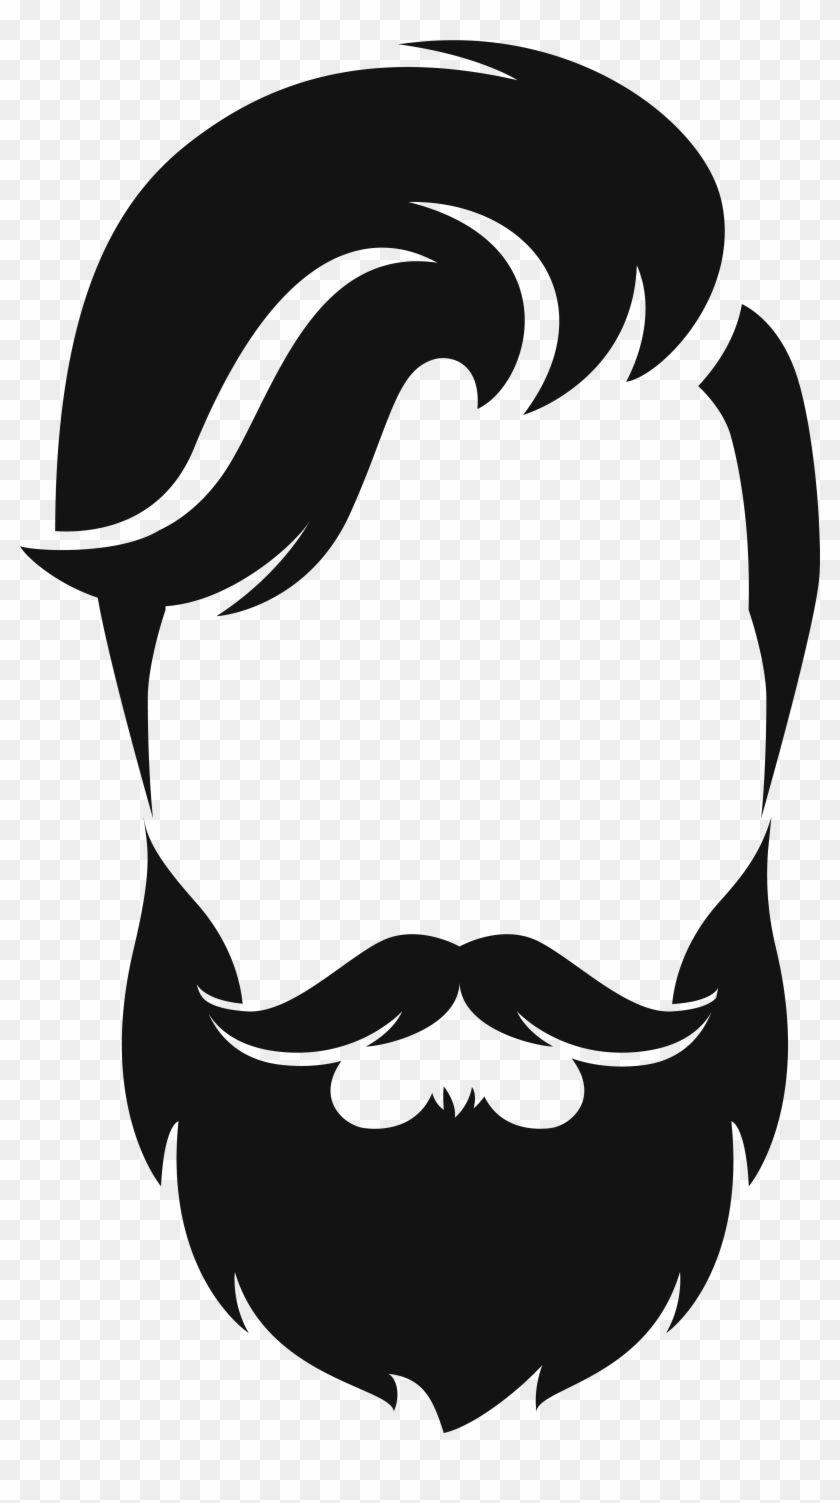 Download Pin by HAZAR WORLD on التصميم in 2020 | Beard logo, Beard ...